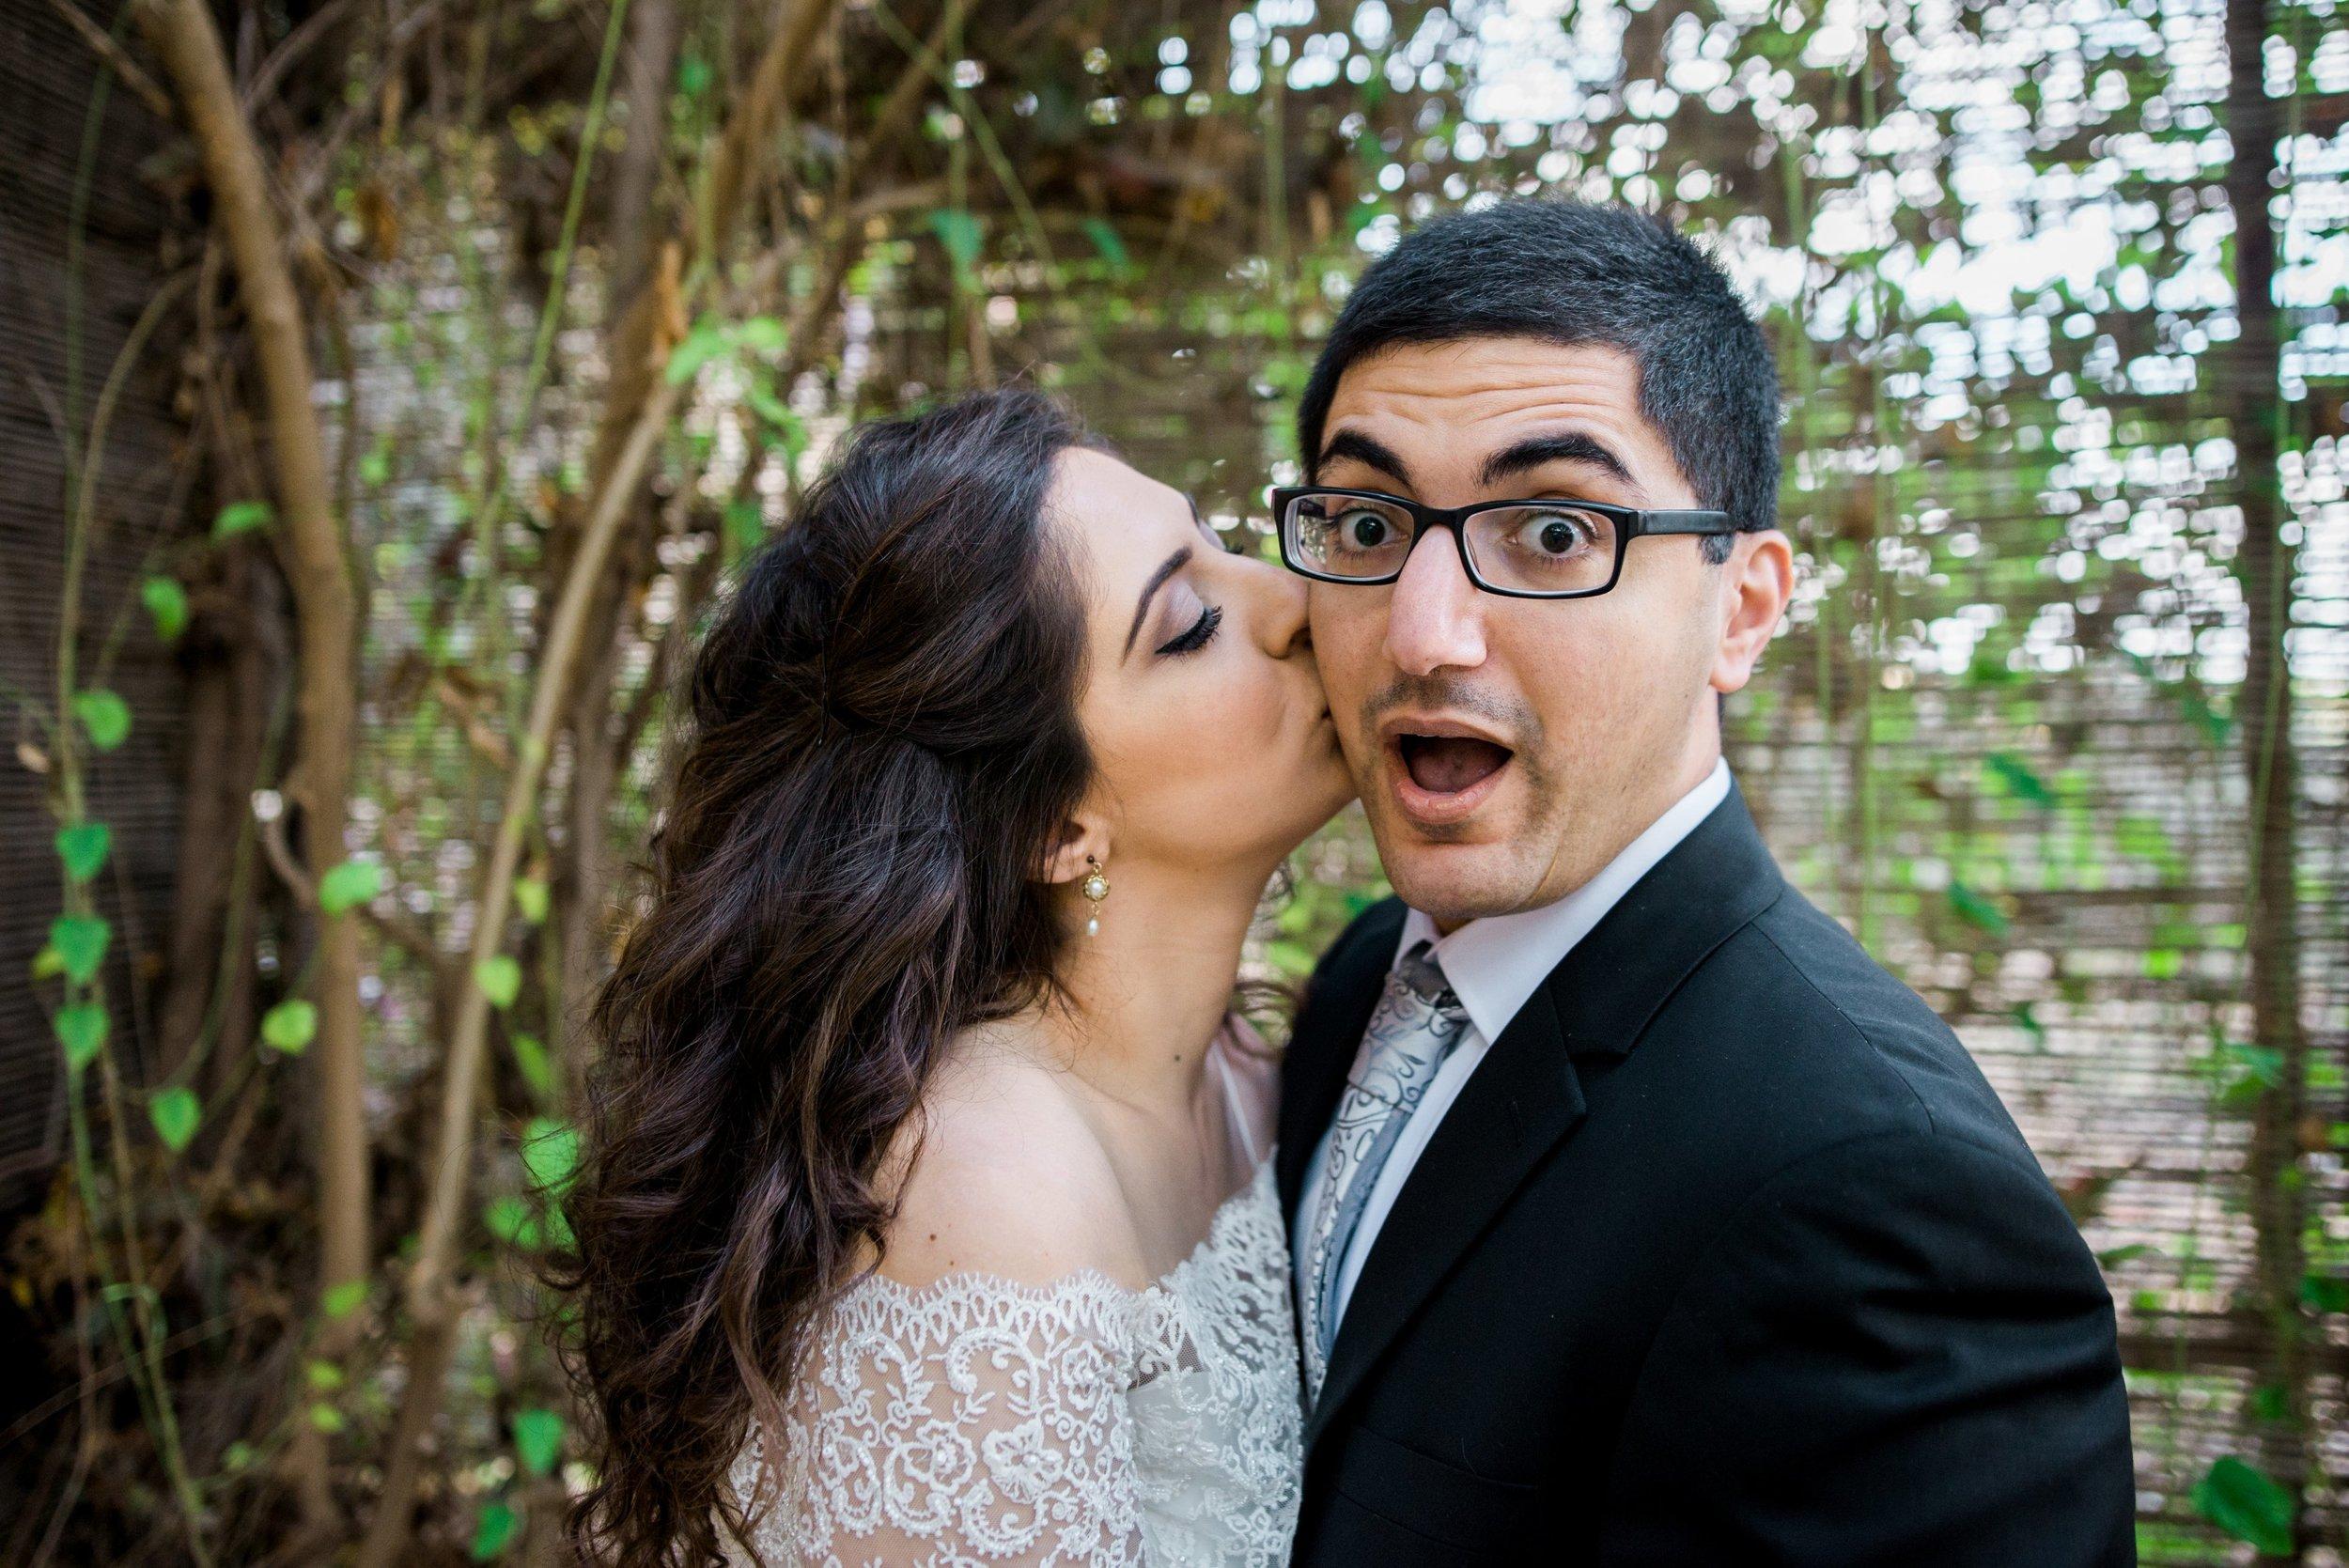 israel-garden-wedding-portraits-session-kate-giryes-photography--26_WEB.jpg